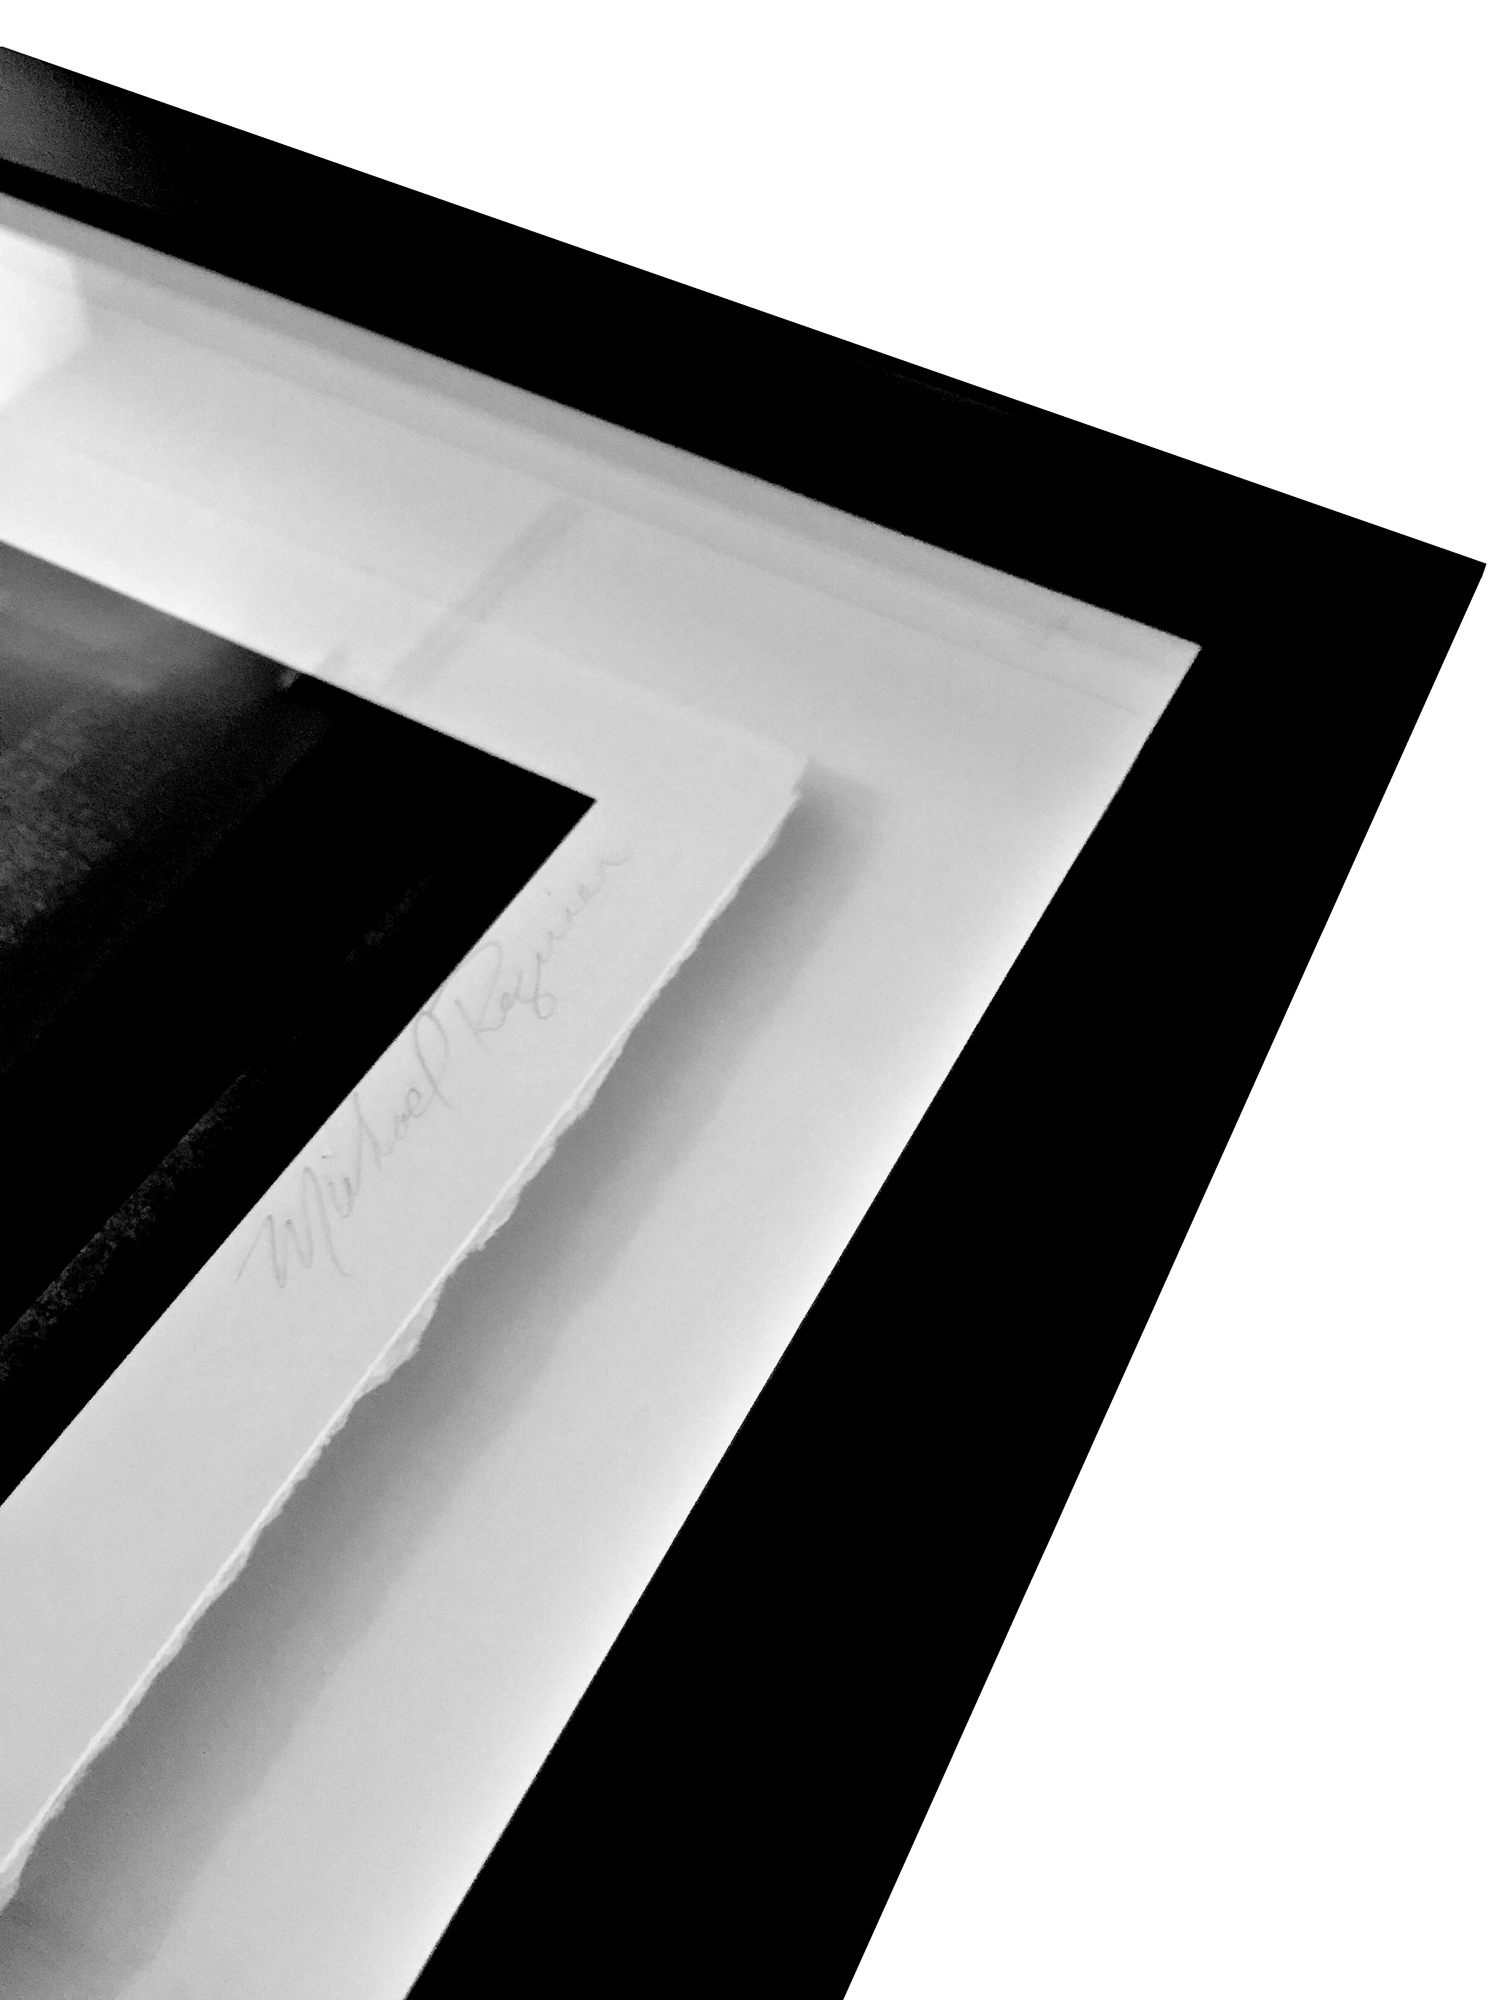 shadow box detail.jpg